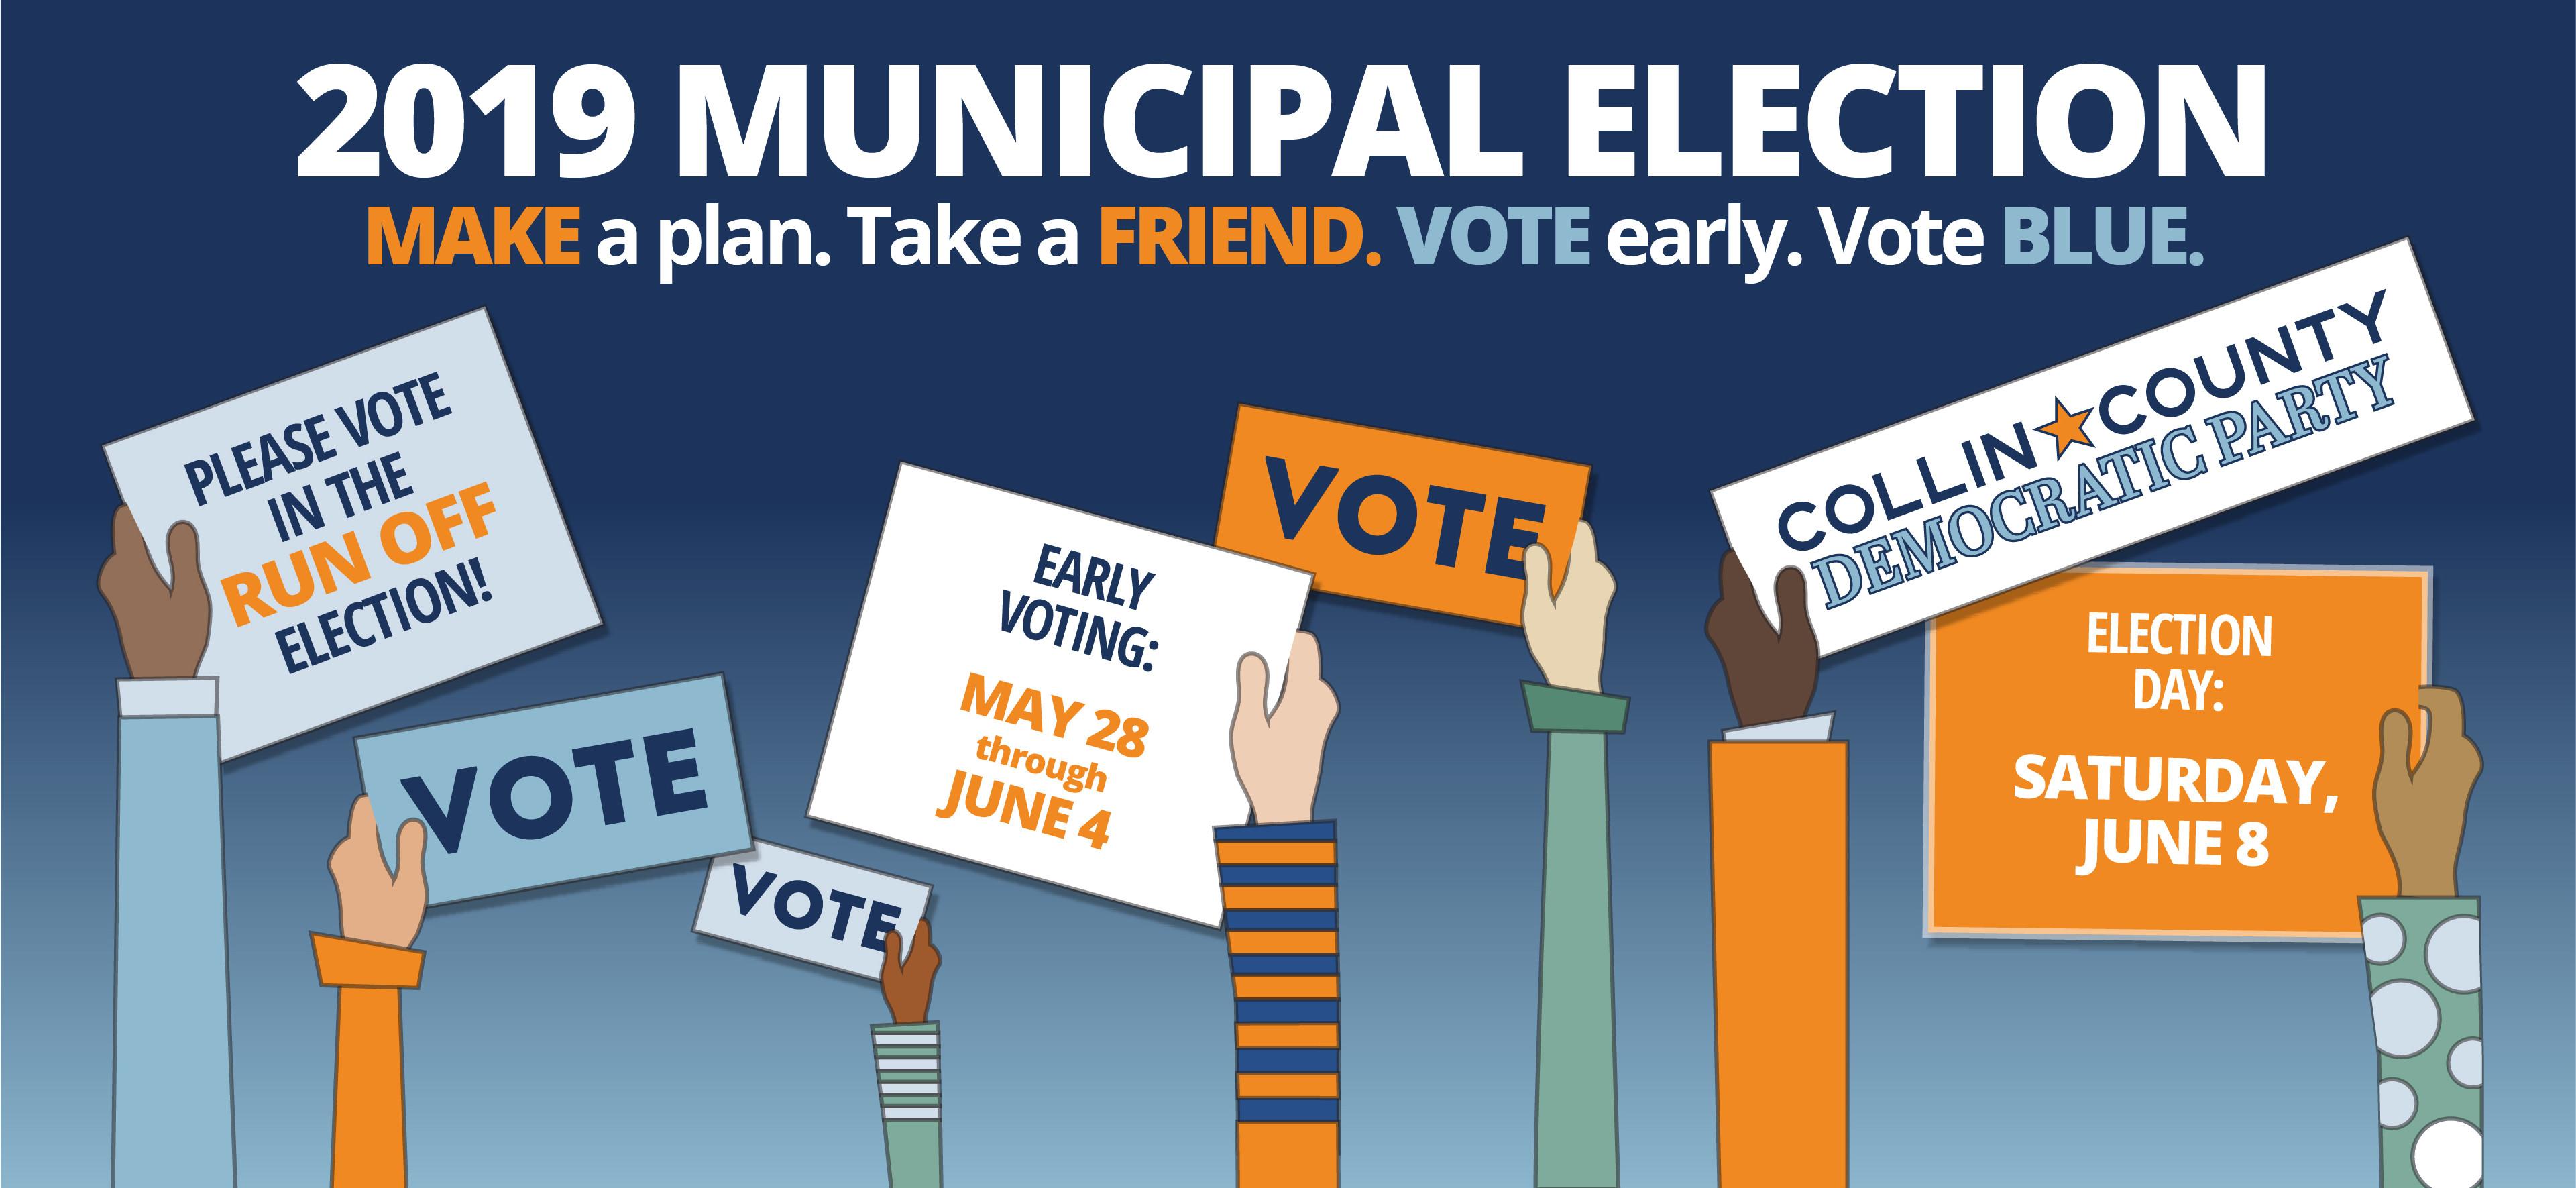 2019 Municipal Election Run Off Dates